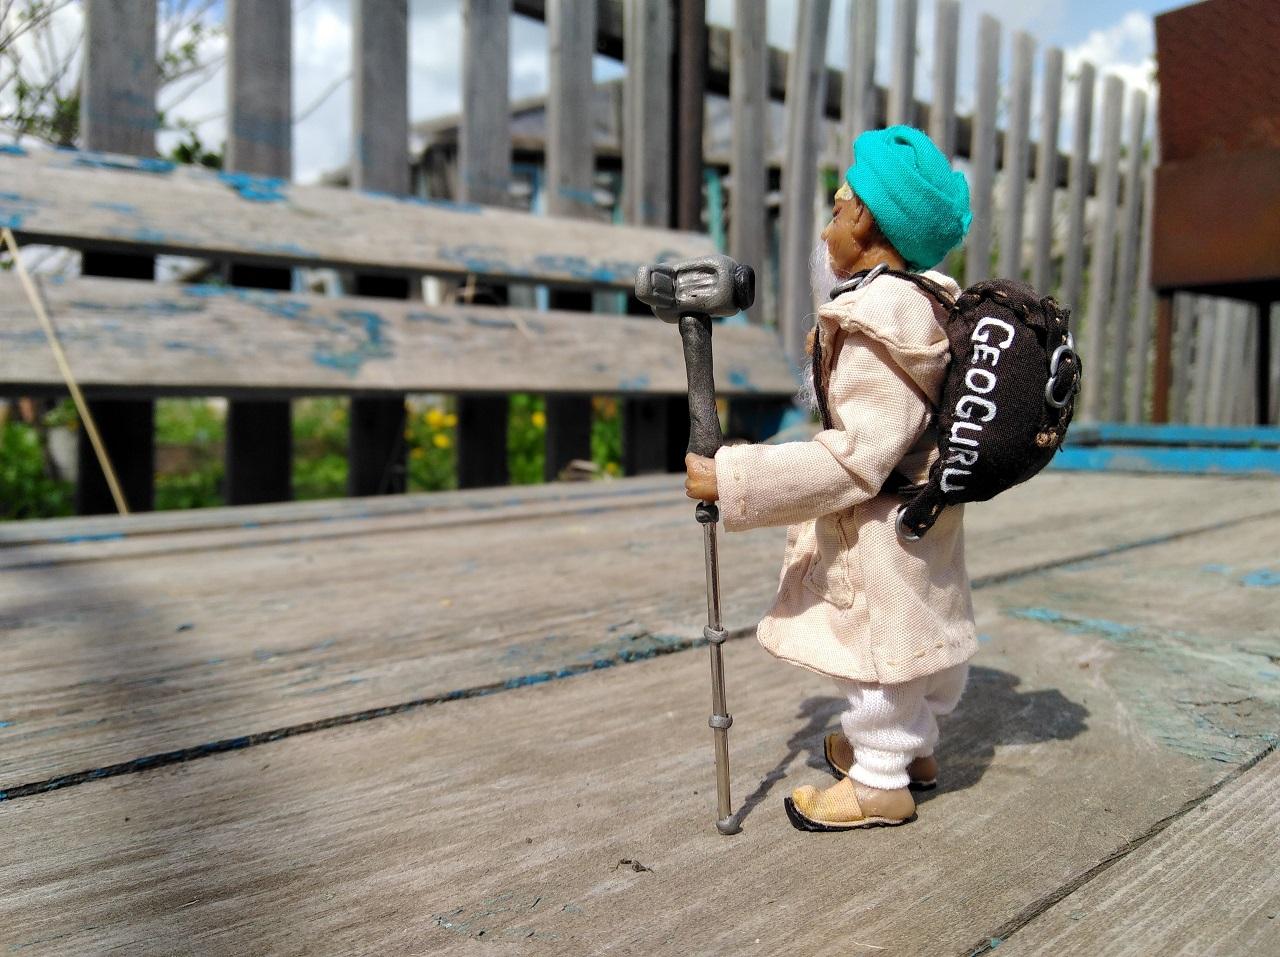 Разработка куклы игрушки на заказ (Geoguru) Игрушки по рисункам Игрушки на заказ по фото, рисункам. Шьем от 1 шт.